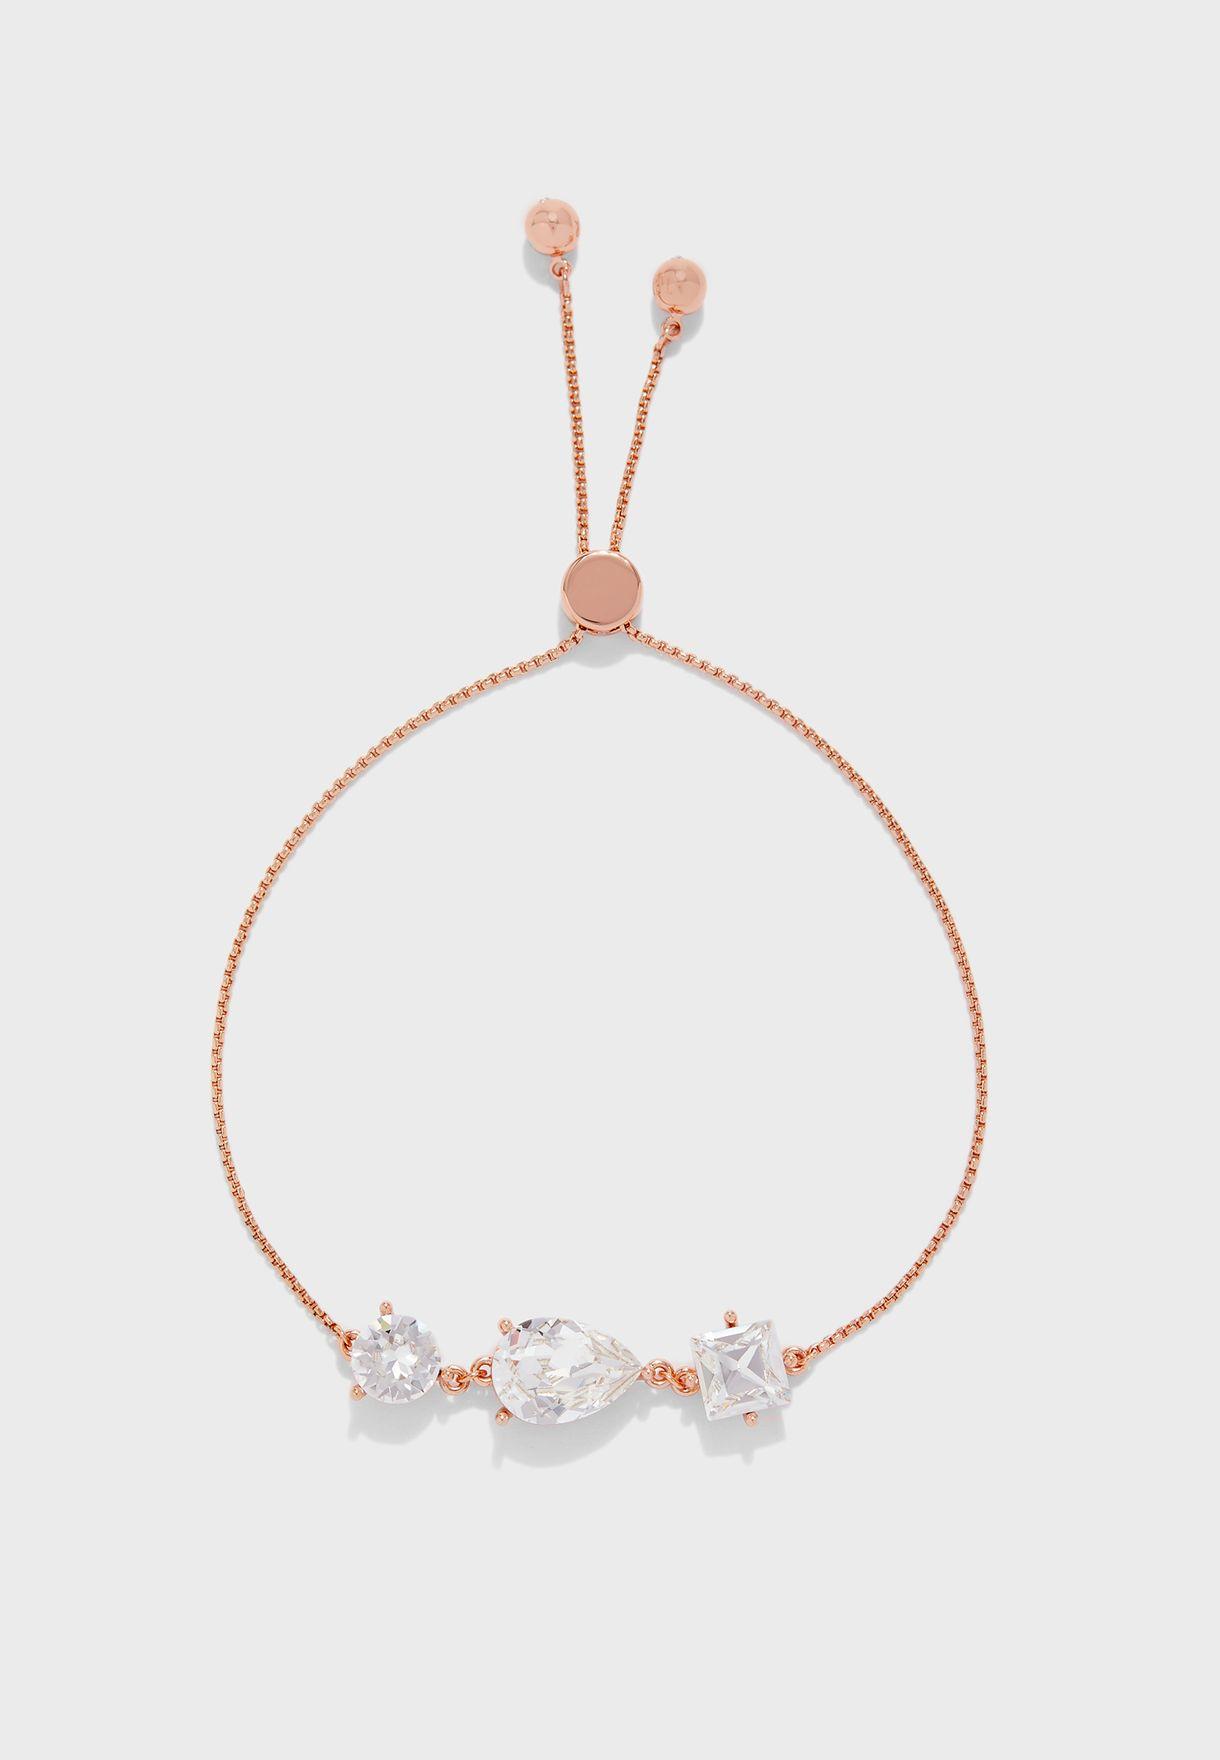 Callab Crystal Candy Bracelet